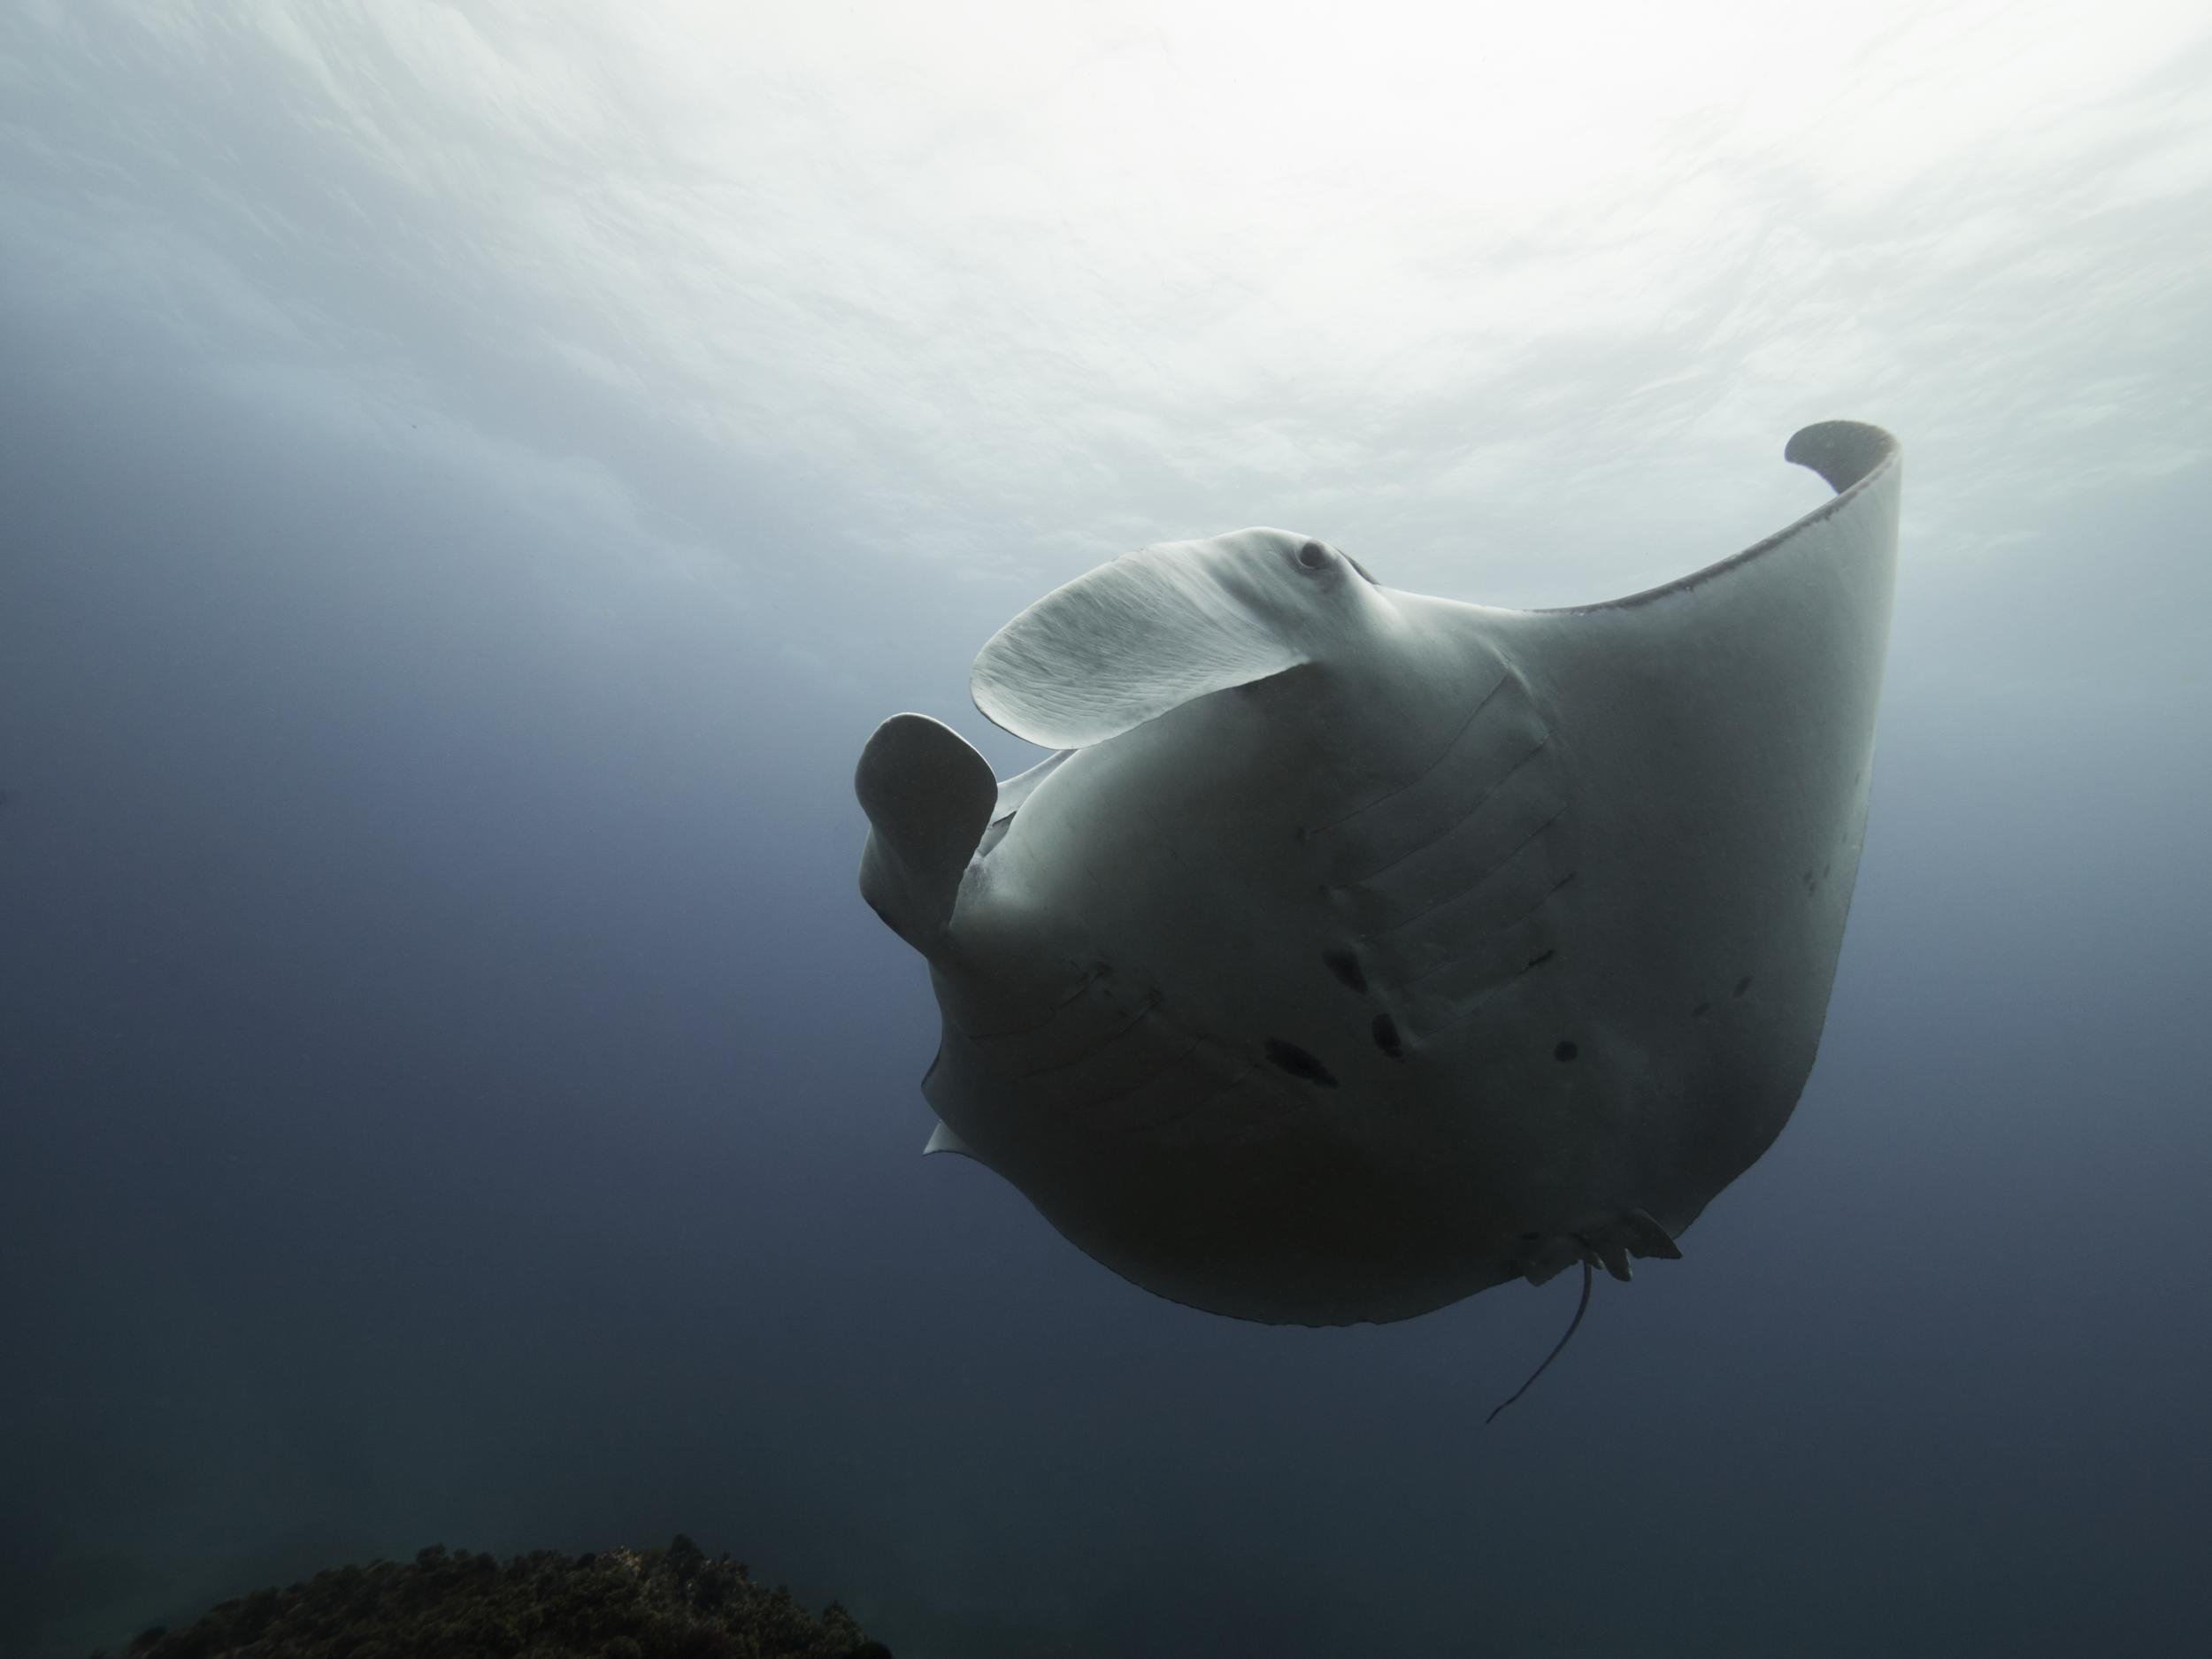 getdown freediving mant ray.jpg